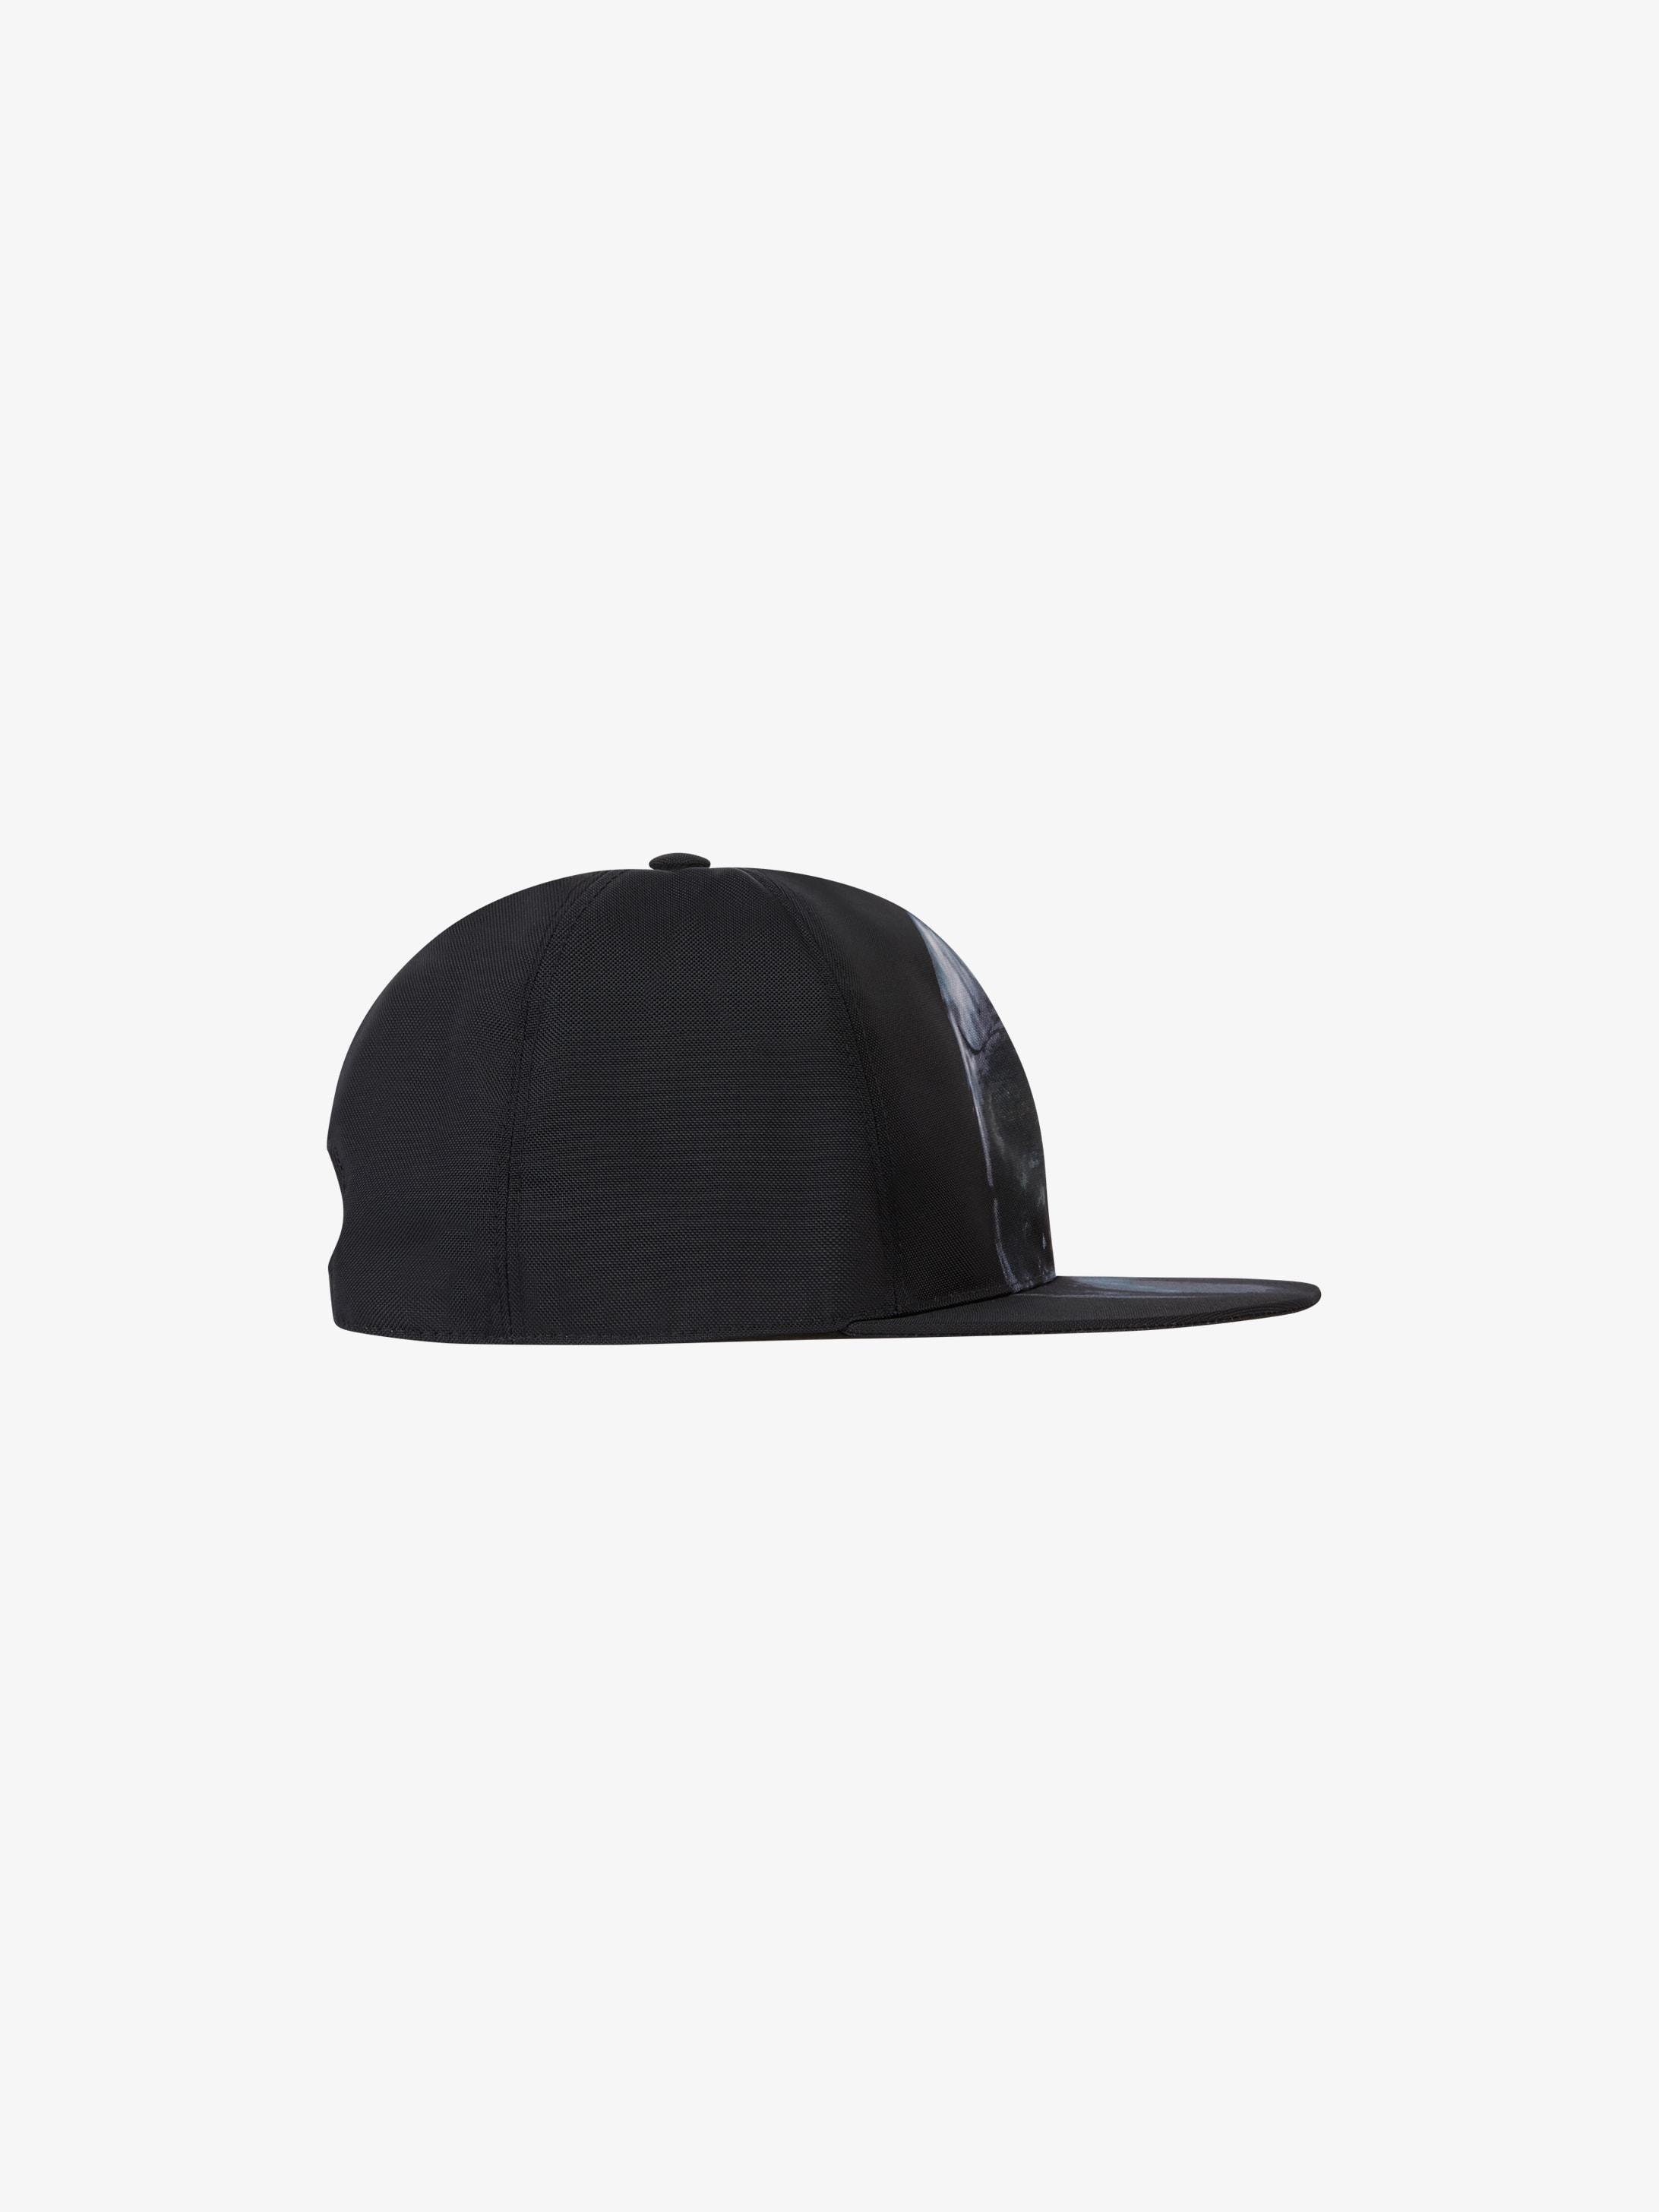 Shark printed cap